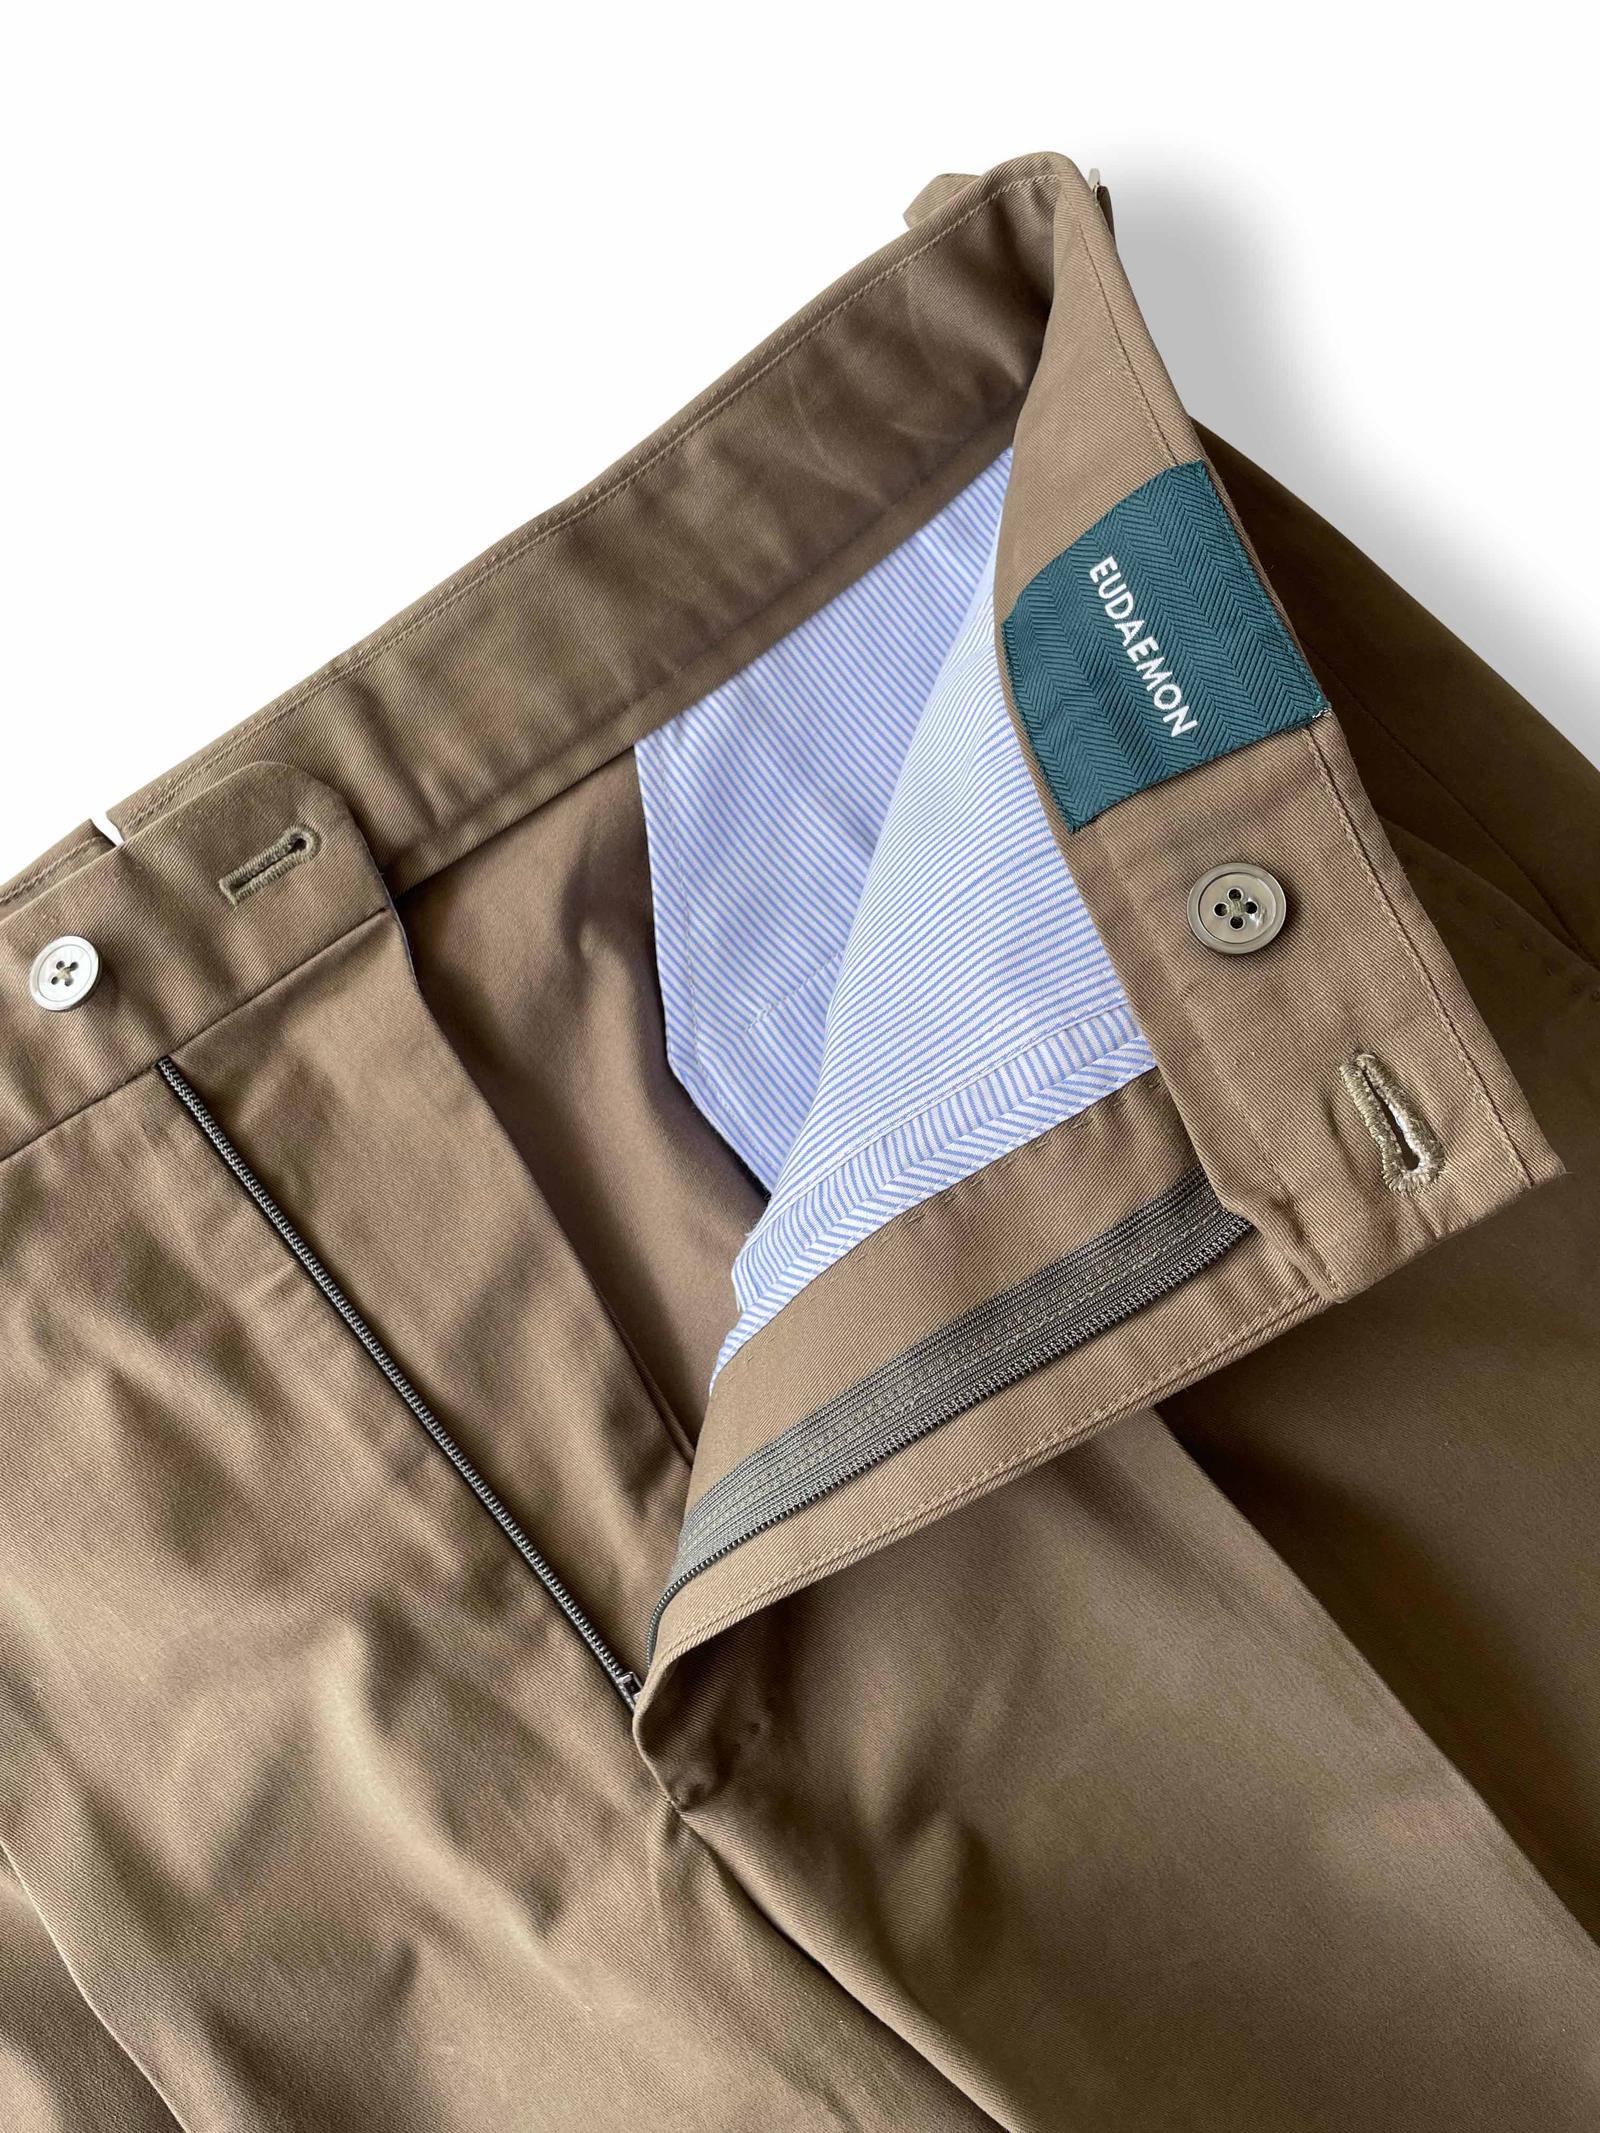 Worko Shorts - Brown Cotton